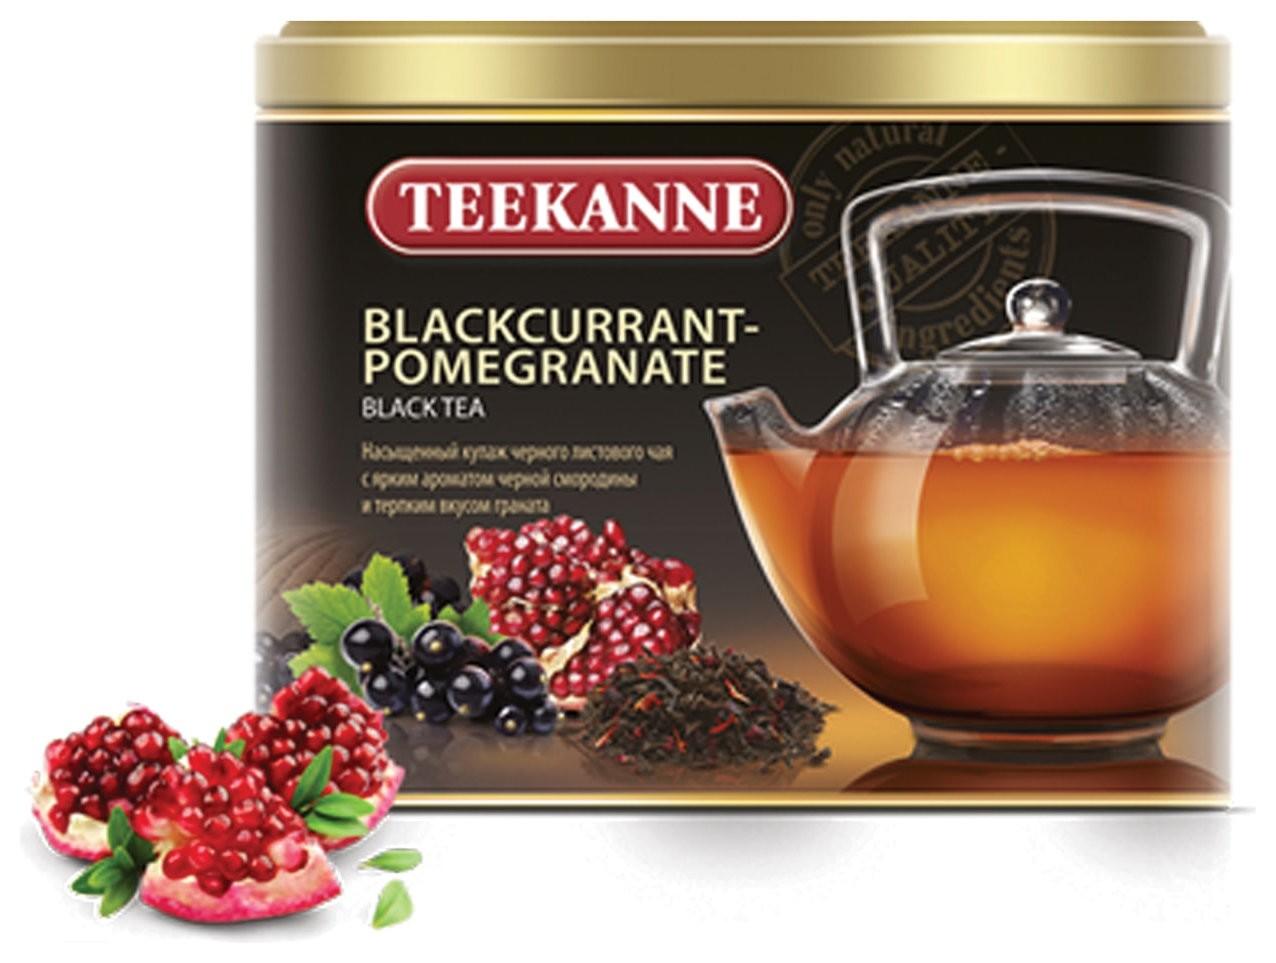 Чай Teekanne (Тиканне) Blackcurrant-pomegranate, черный, смородина/гранат, листовой, 150 г, ж/б, германия Teekanne